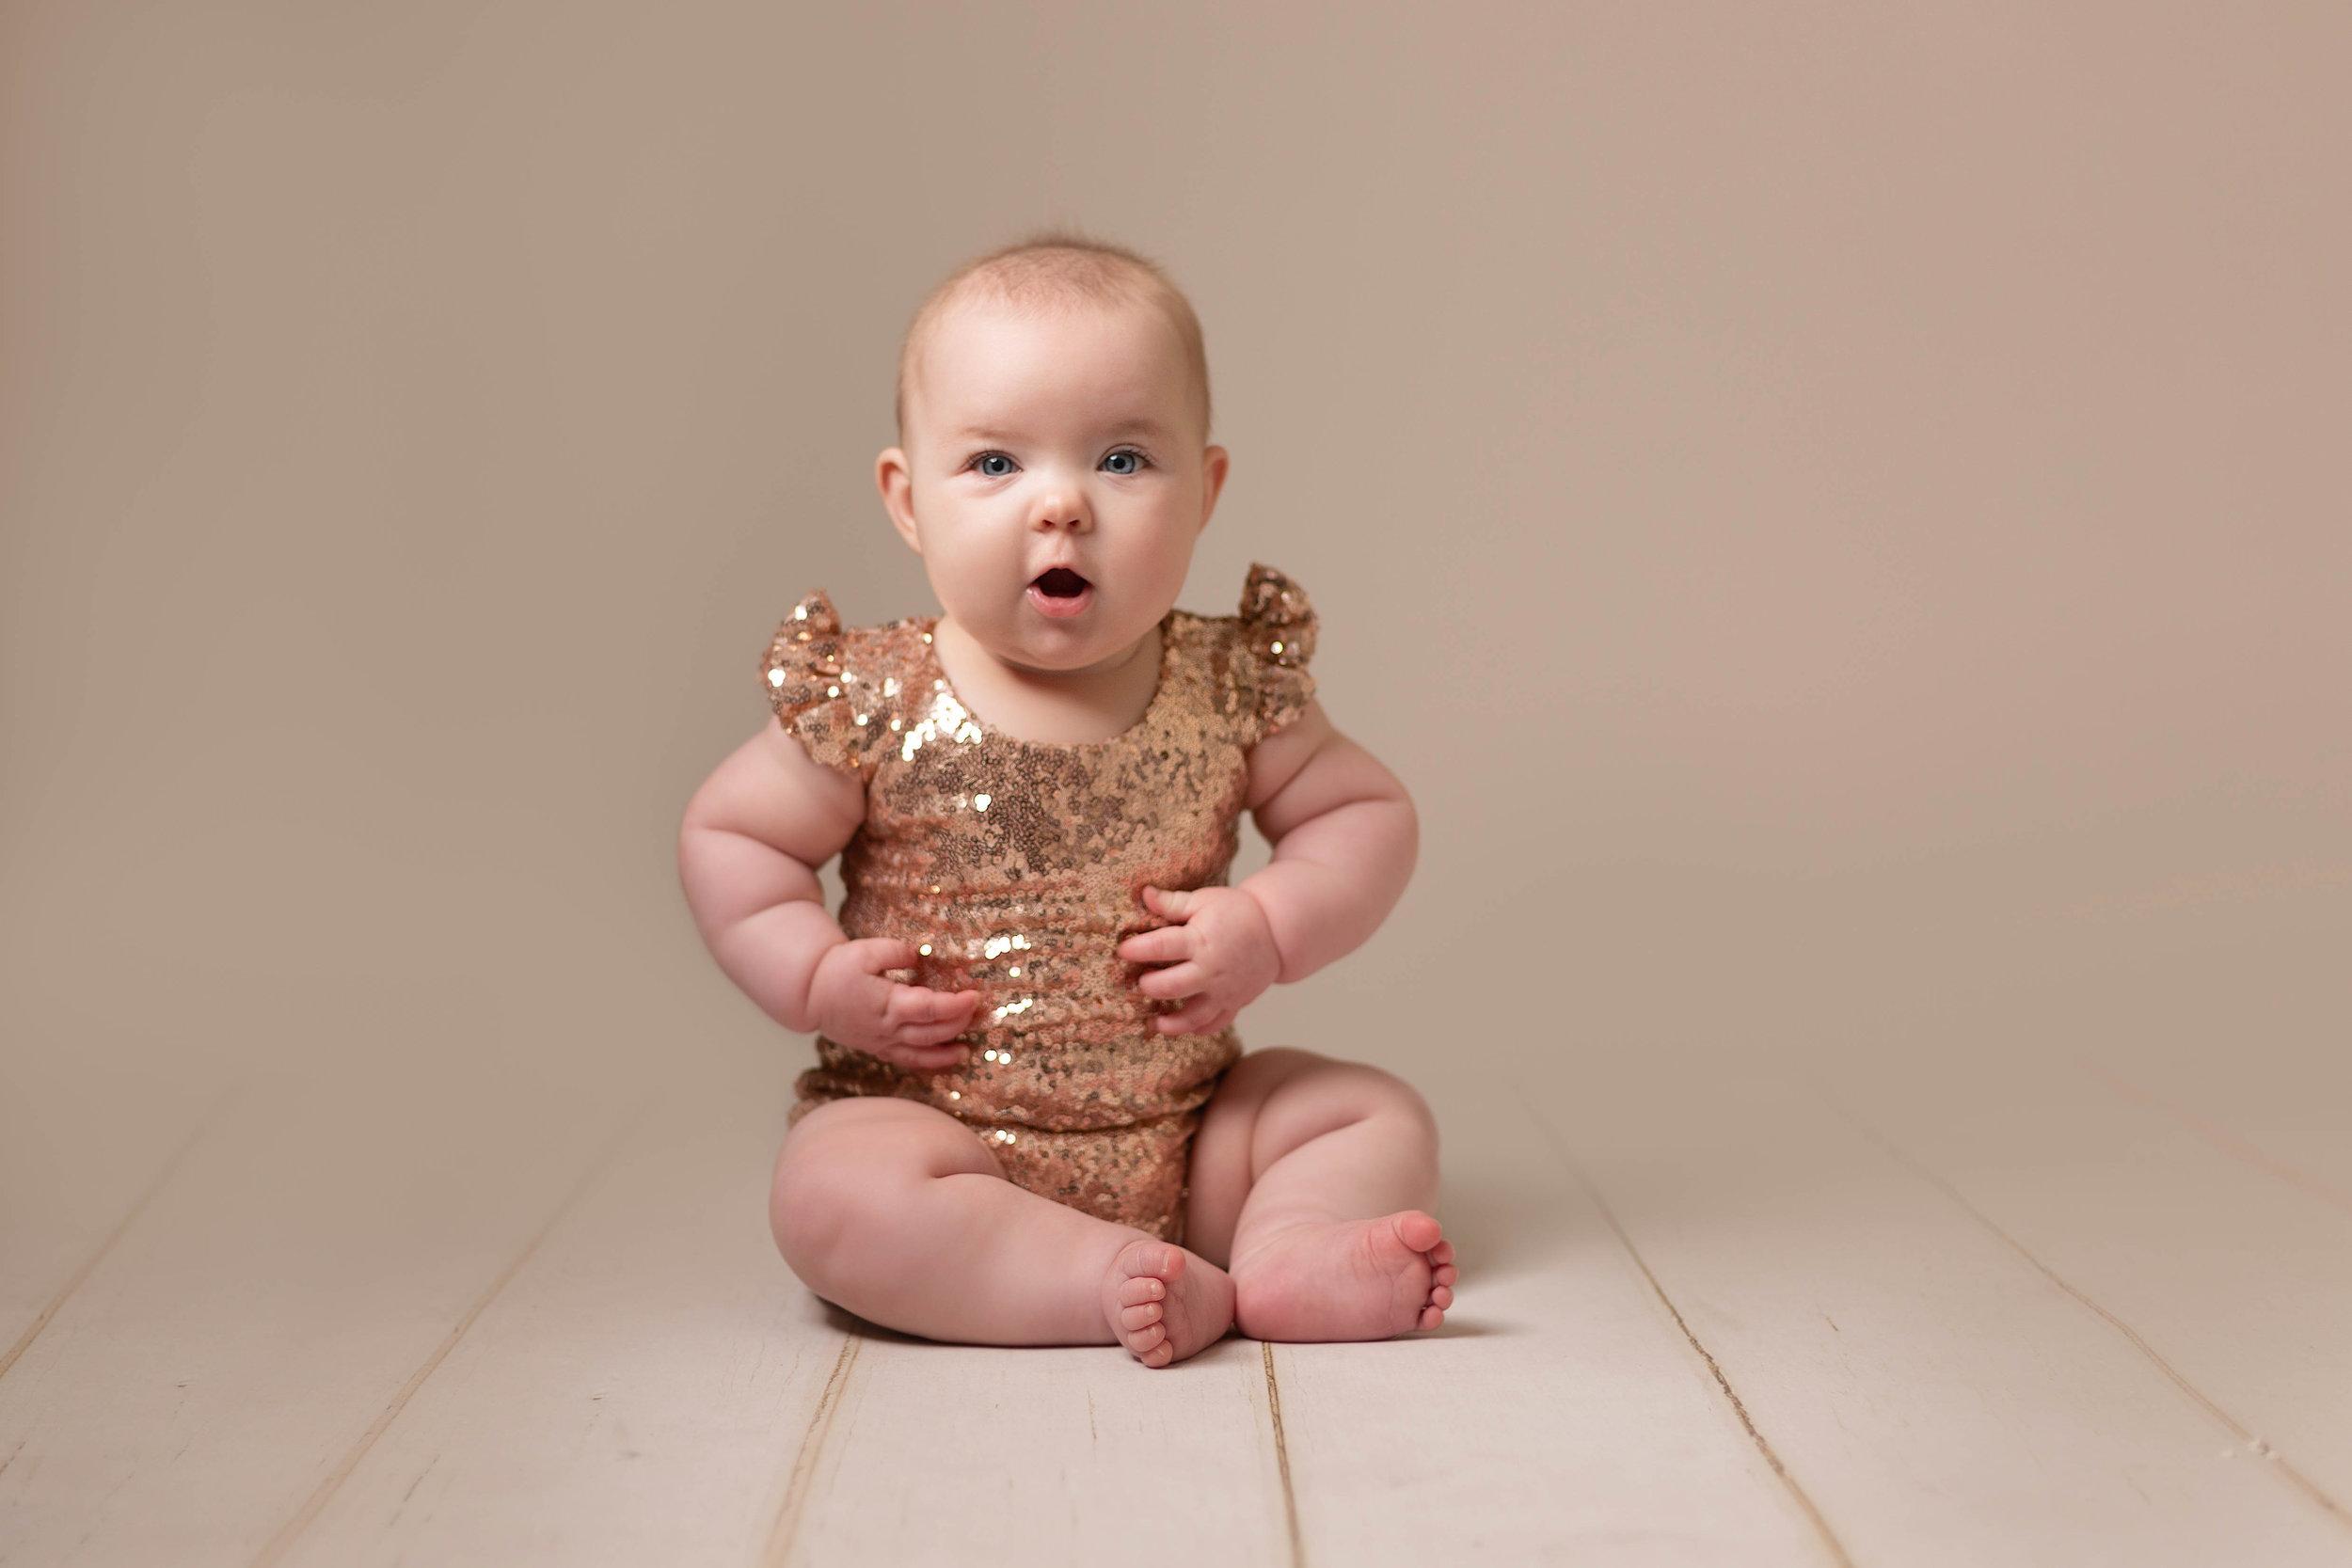 LEA-COOPER-PHOTOGRAPHY-CHILD-PHOTOGRAPHY-WILLENHALL-CHILDREN-PHOTOGRAPHER-WOLVERHAMPTON-BILSTON-WEDNESBURY-KIDS-PHOTOGRAPHER-SITTER-SESSION-MILESTONE--5.JPG